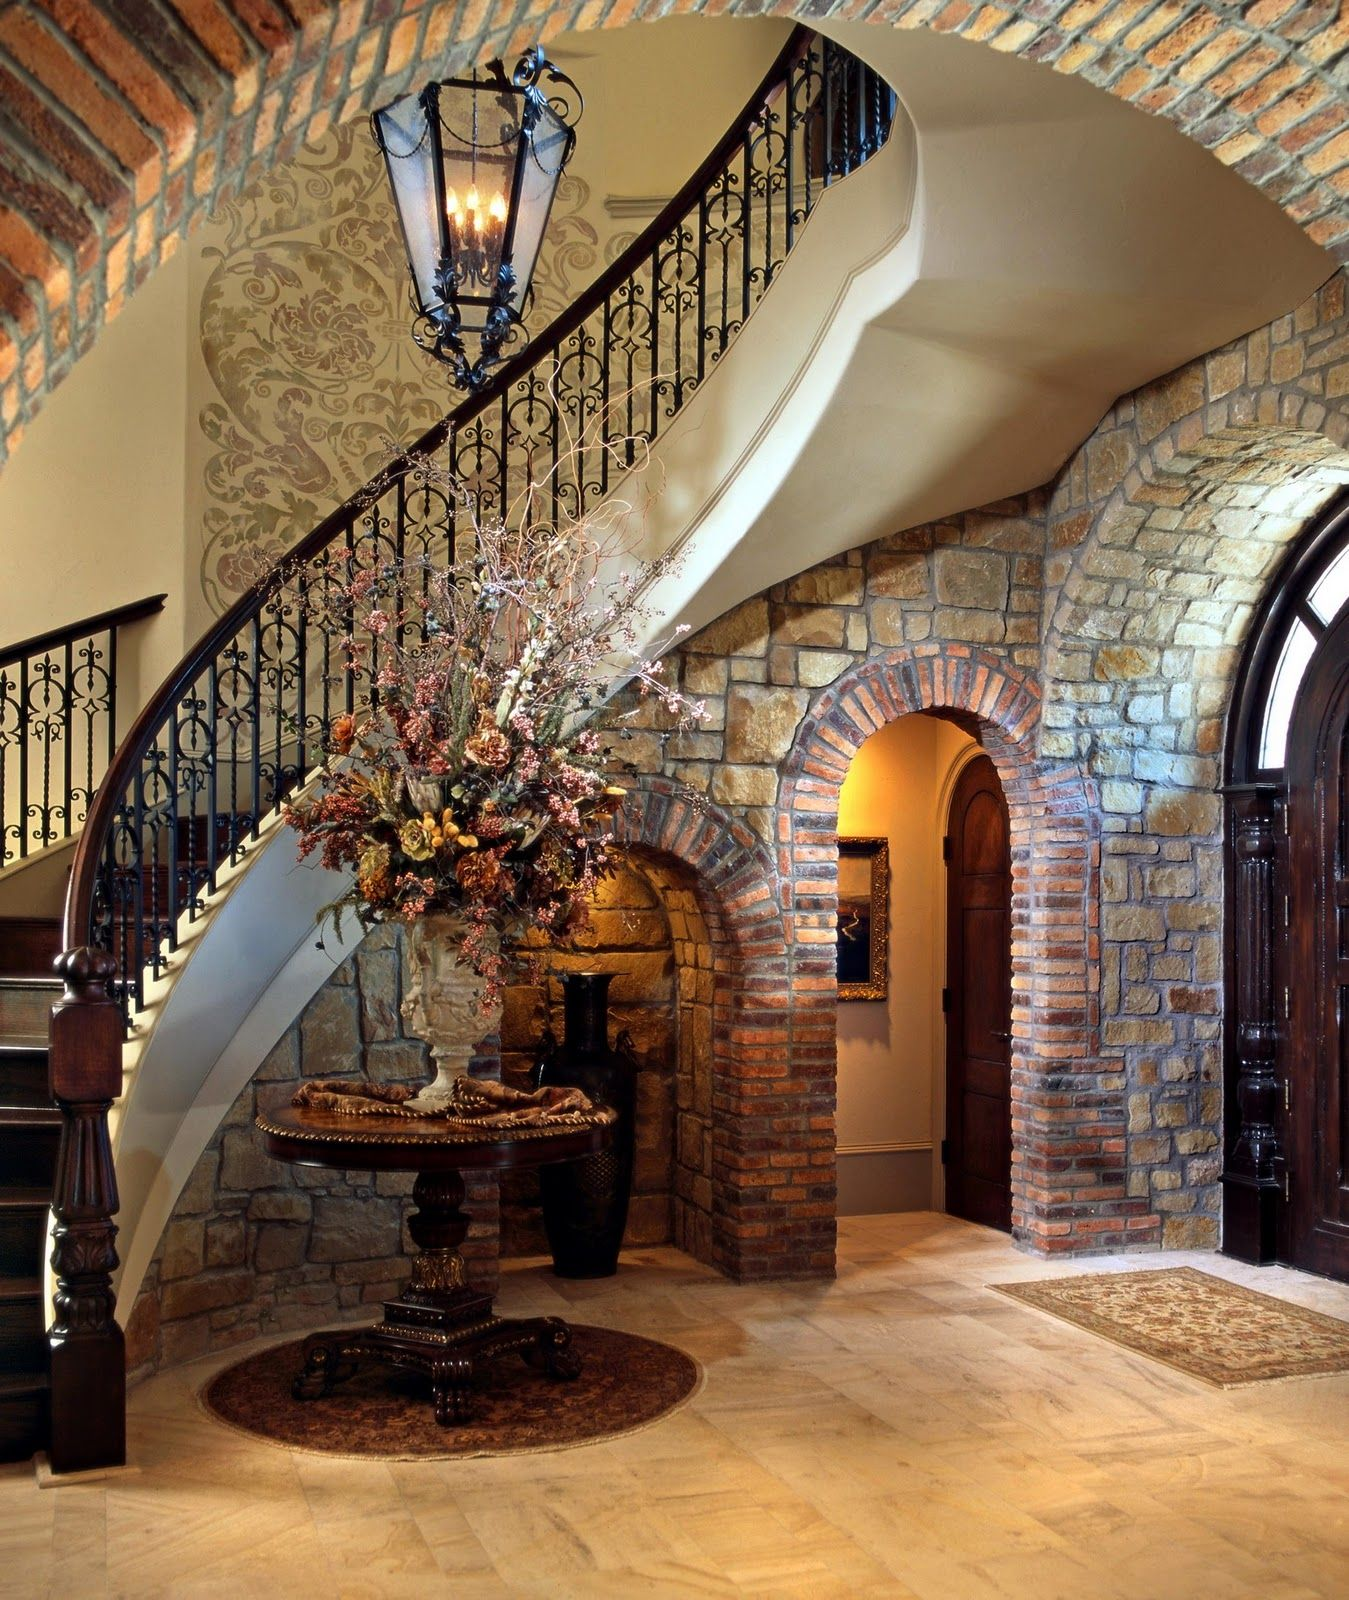 Lomonaco's Iron Concepts & Home Decor: Tuscan Curved